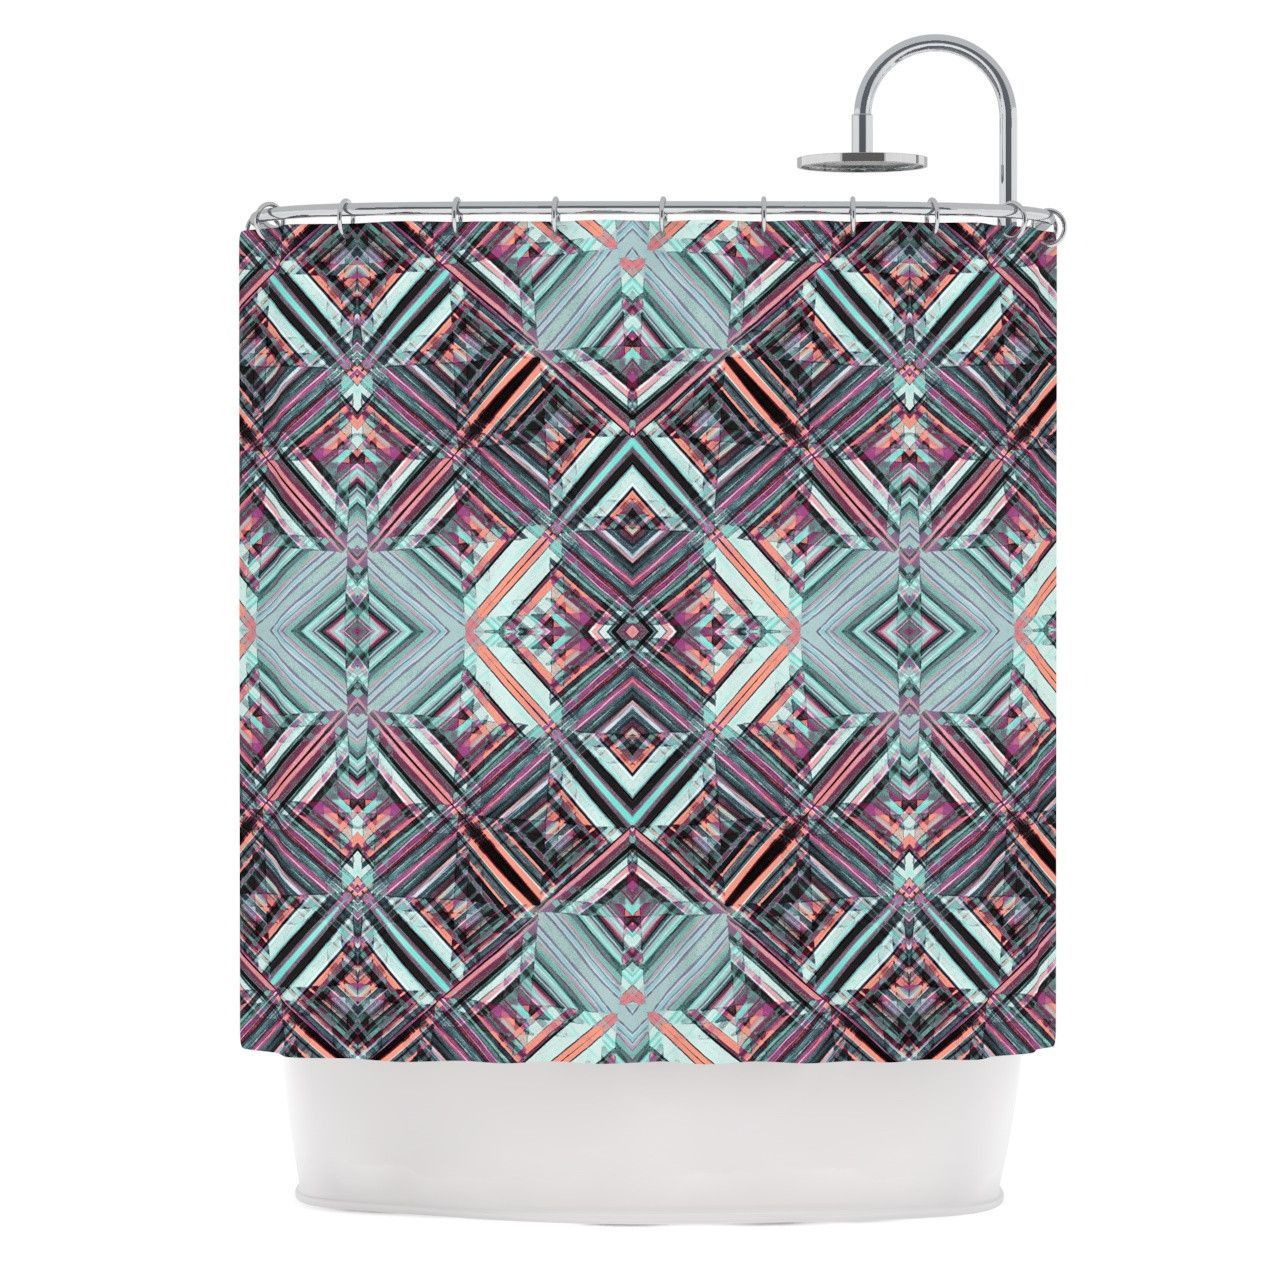 Gabriela Fuente Watercolor Caledoscope Purple Teal Shower Curtain